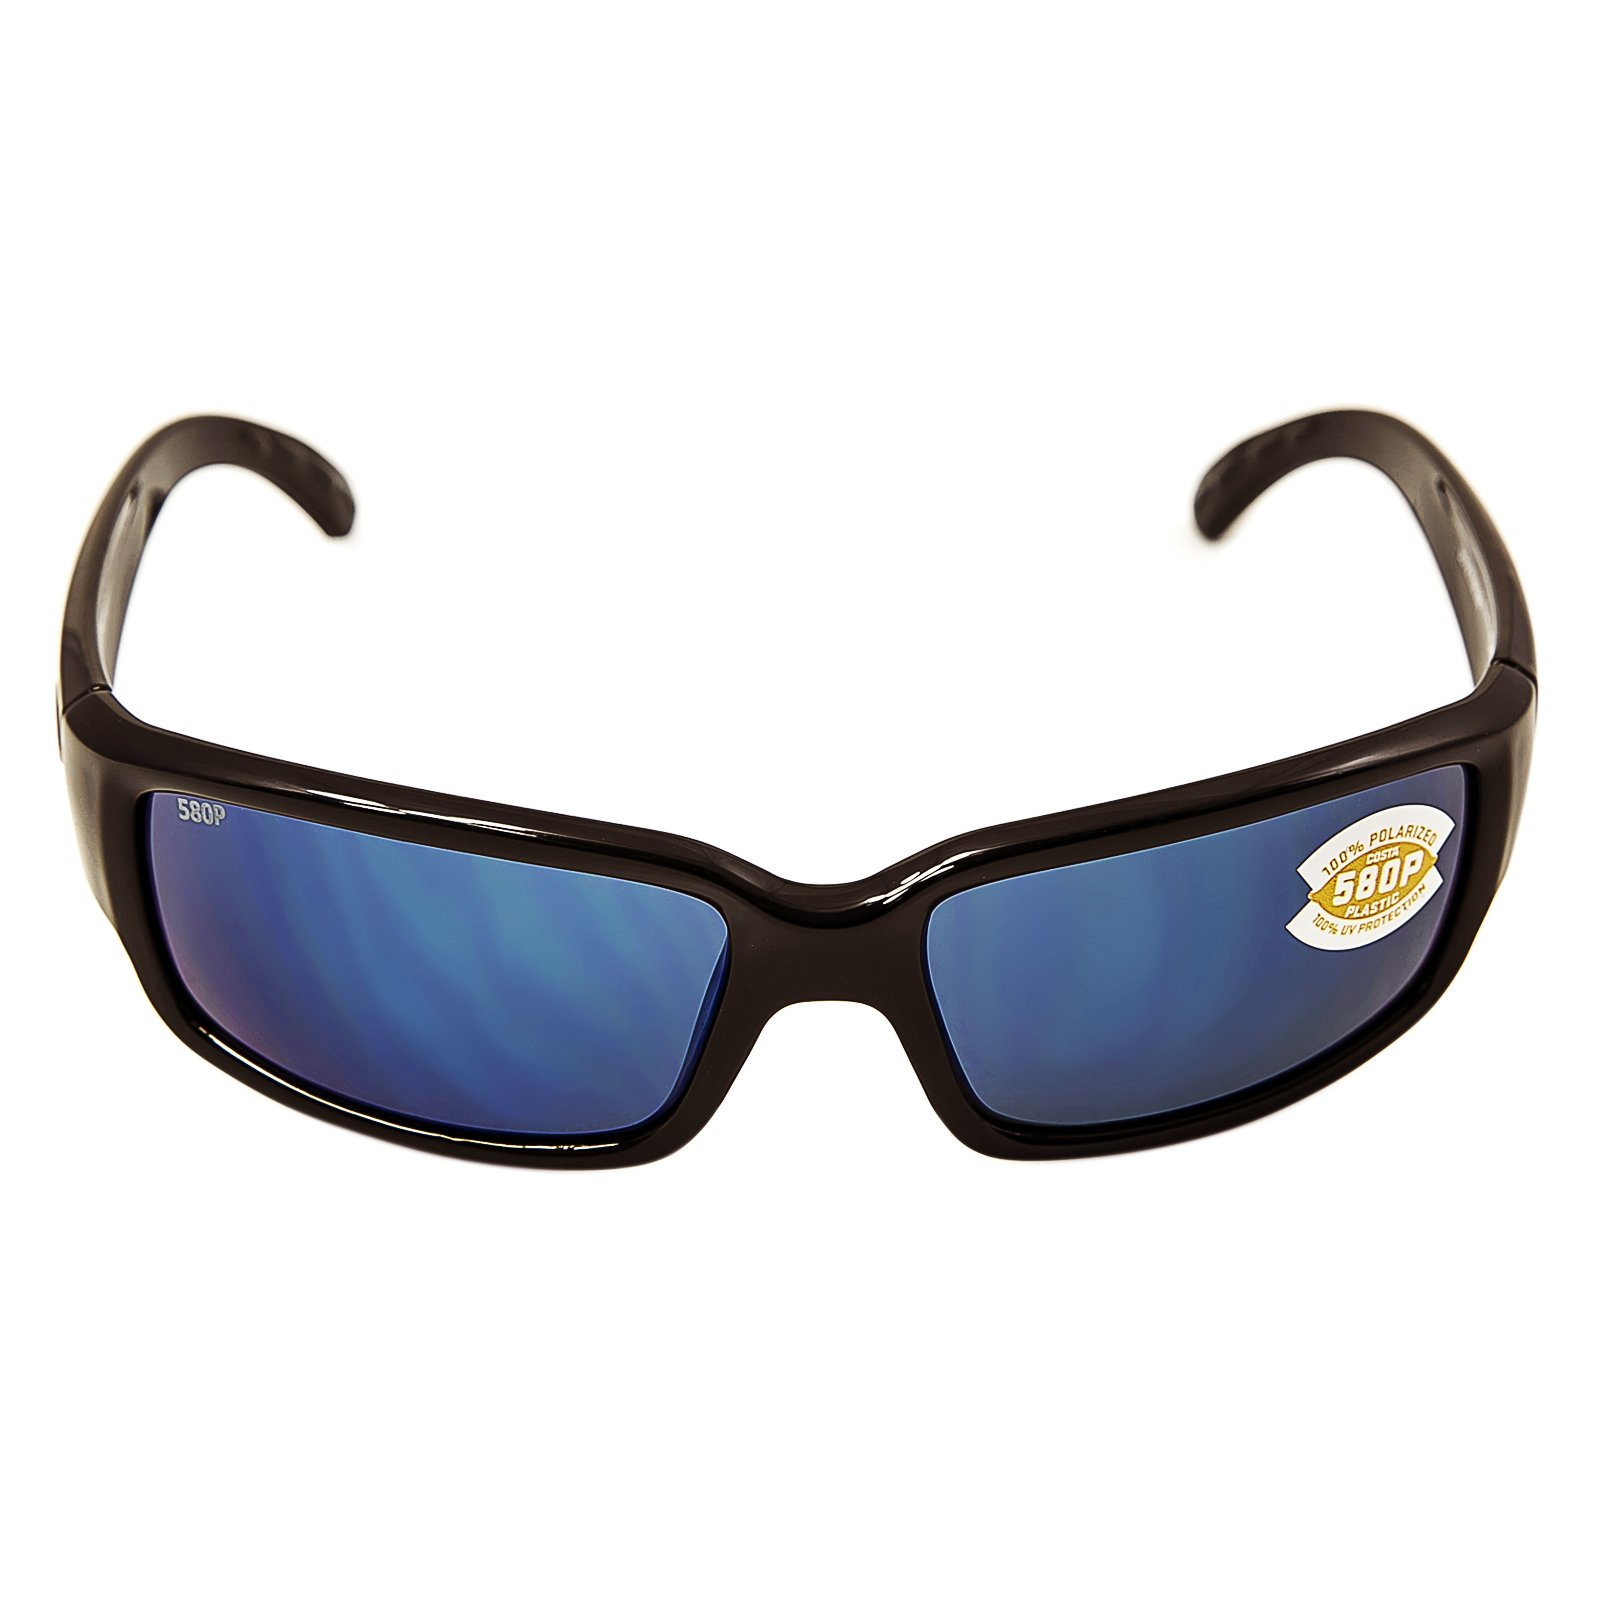 Costa del Mar Cabalitto Polarized Iridium Wrap Sunglasses, Black, 59.2 mm